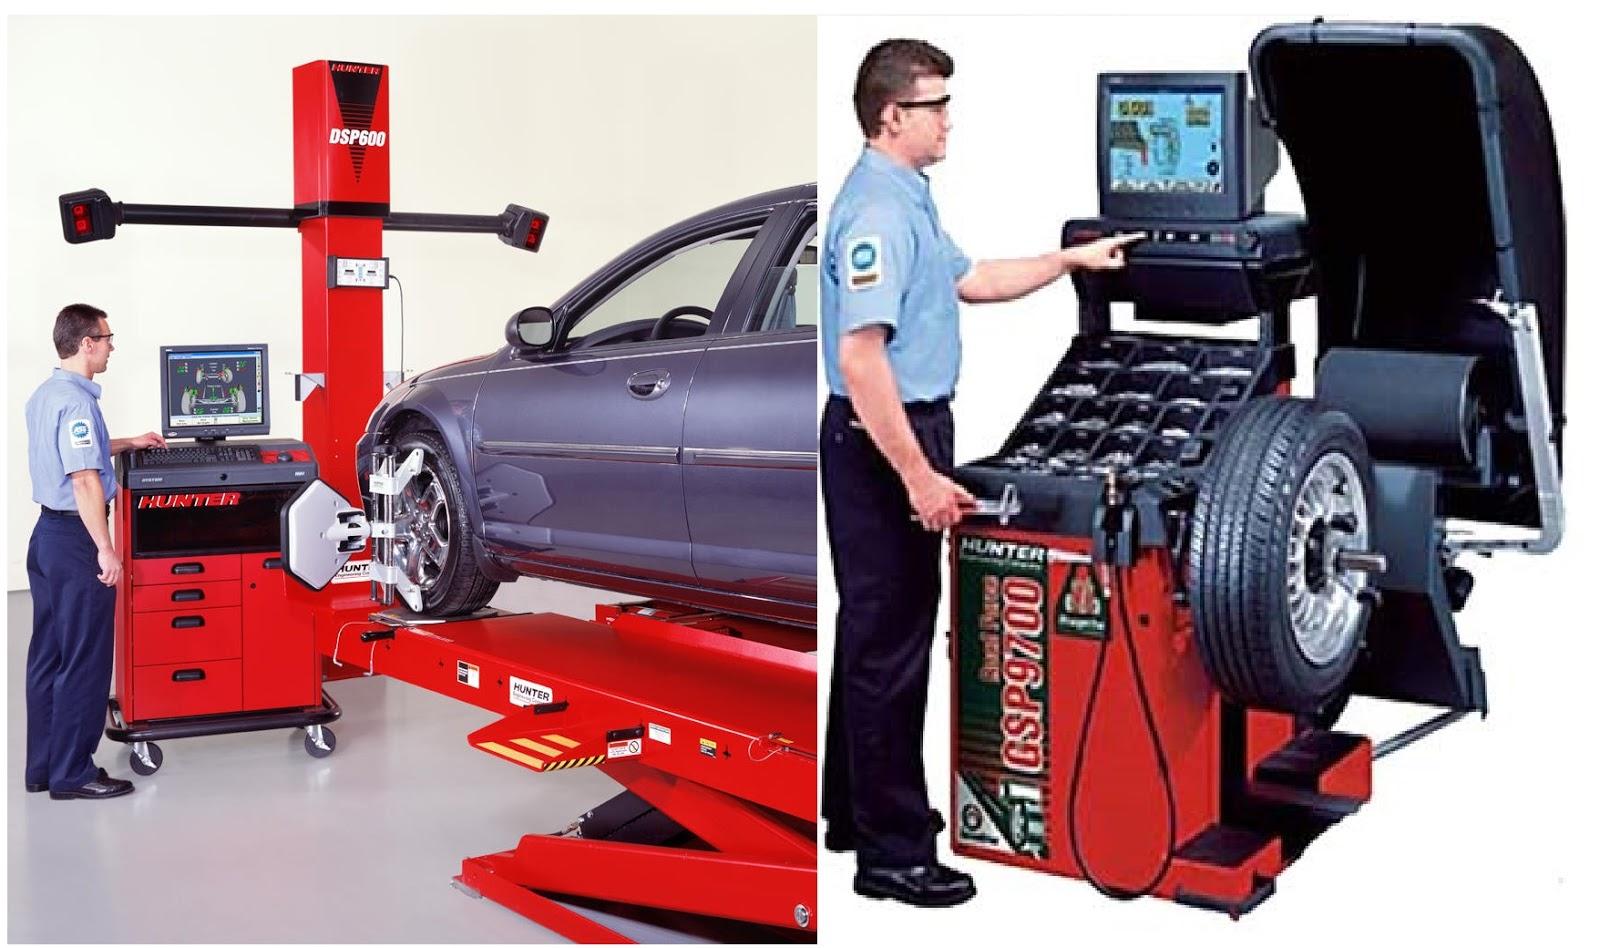 Solusi Murah Meriah Upgrade Velg Kaleng Standar Vios Limo Extaksi Ban Mobil Gt Champiro Eco 175 65r14 Vocer Spooring Balancing